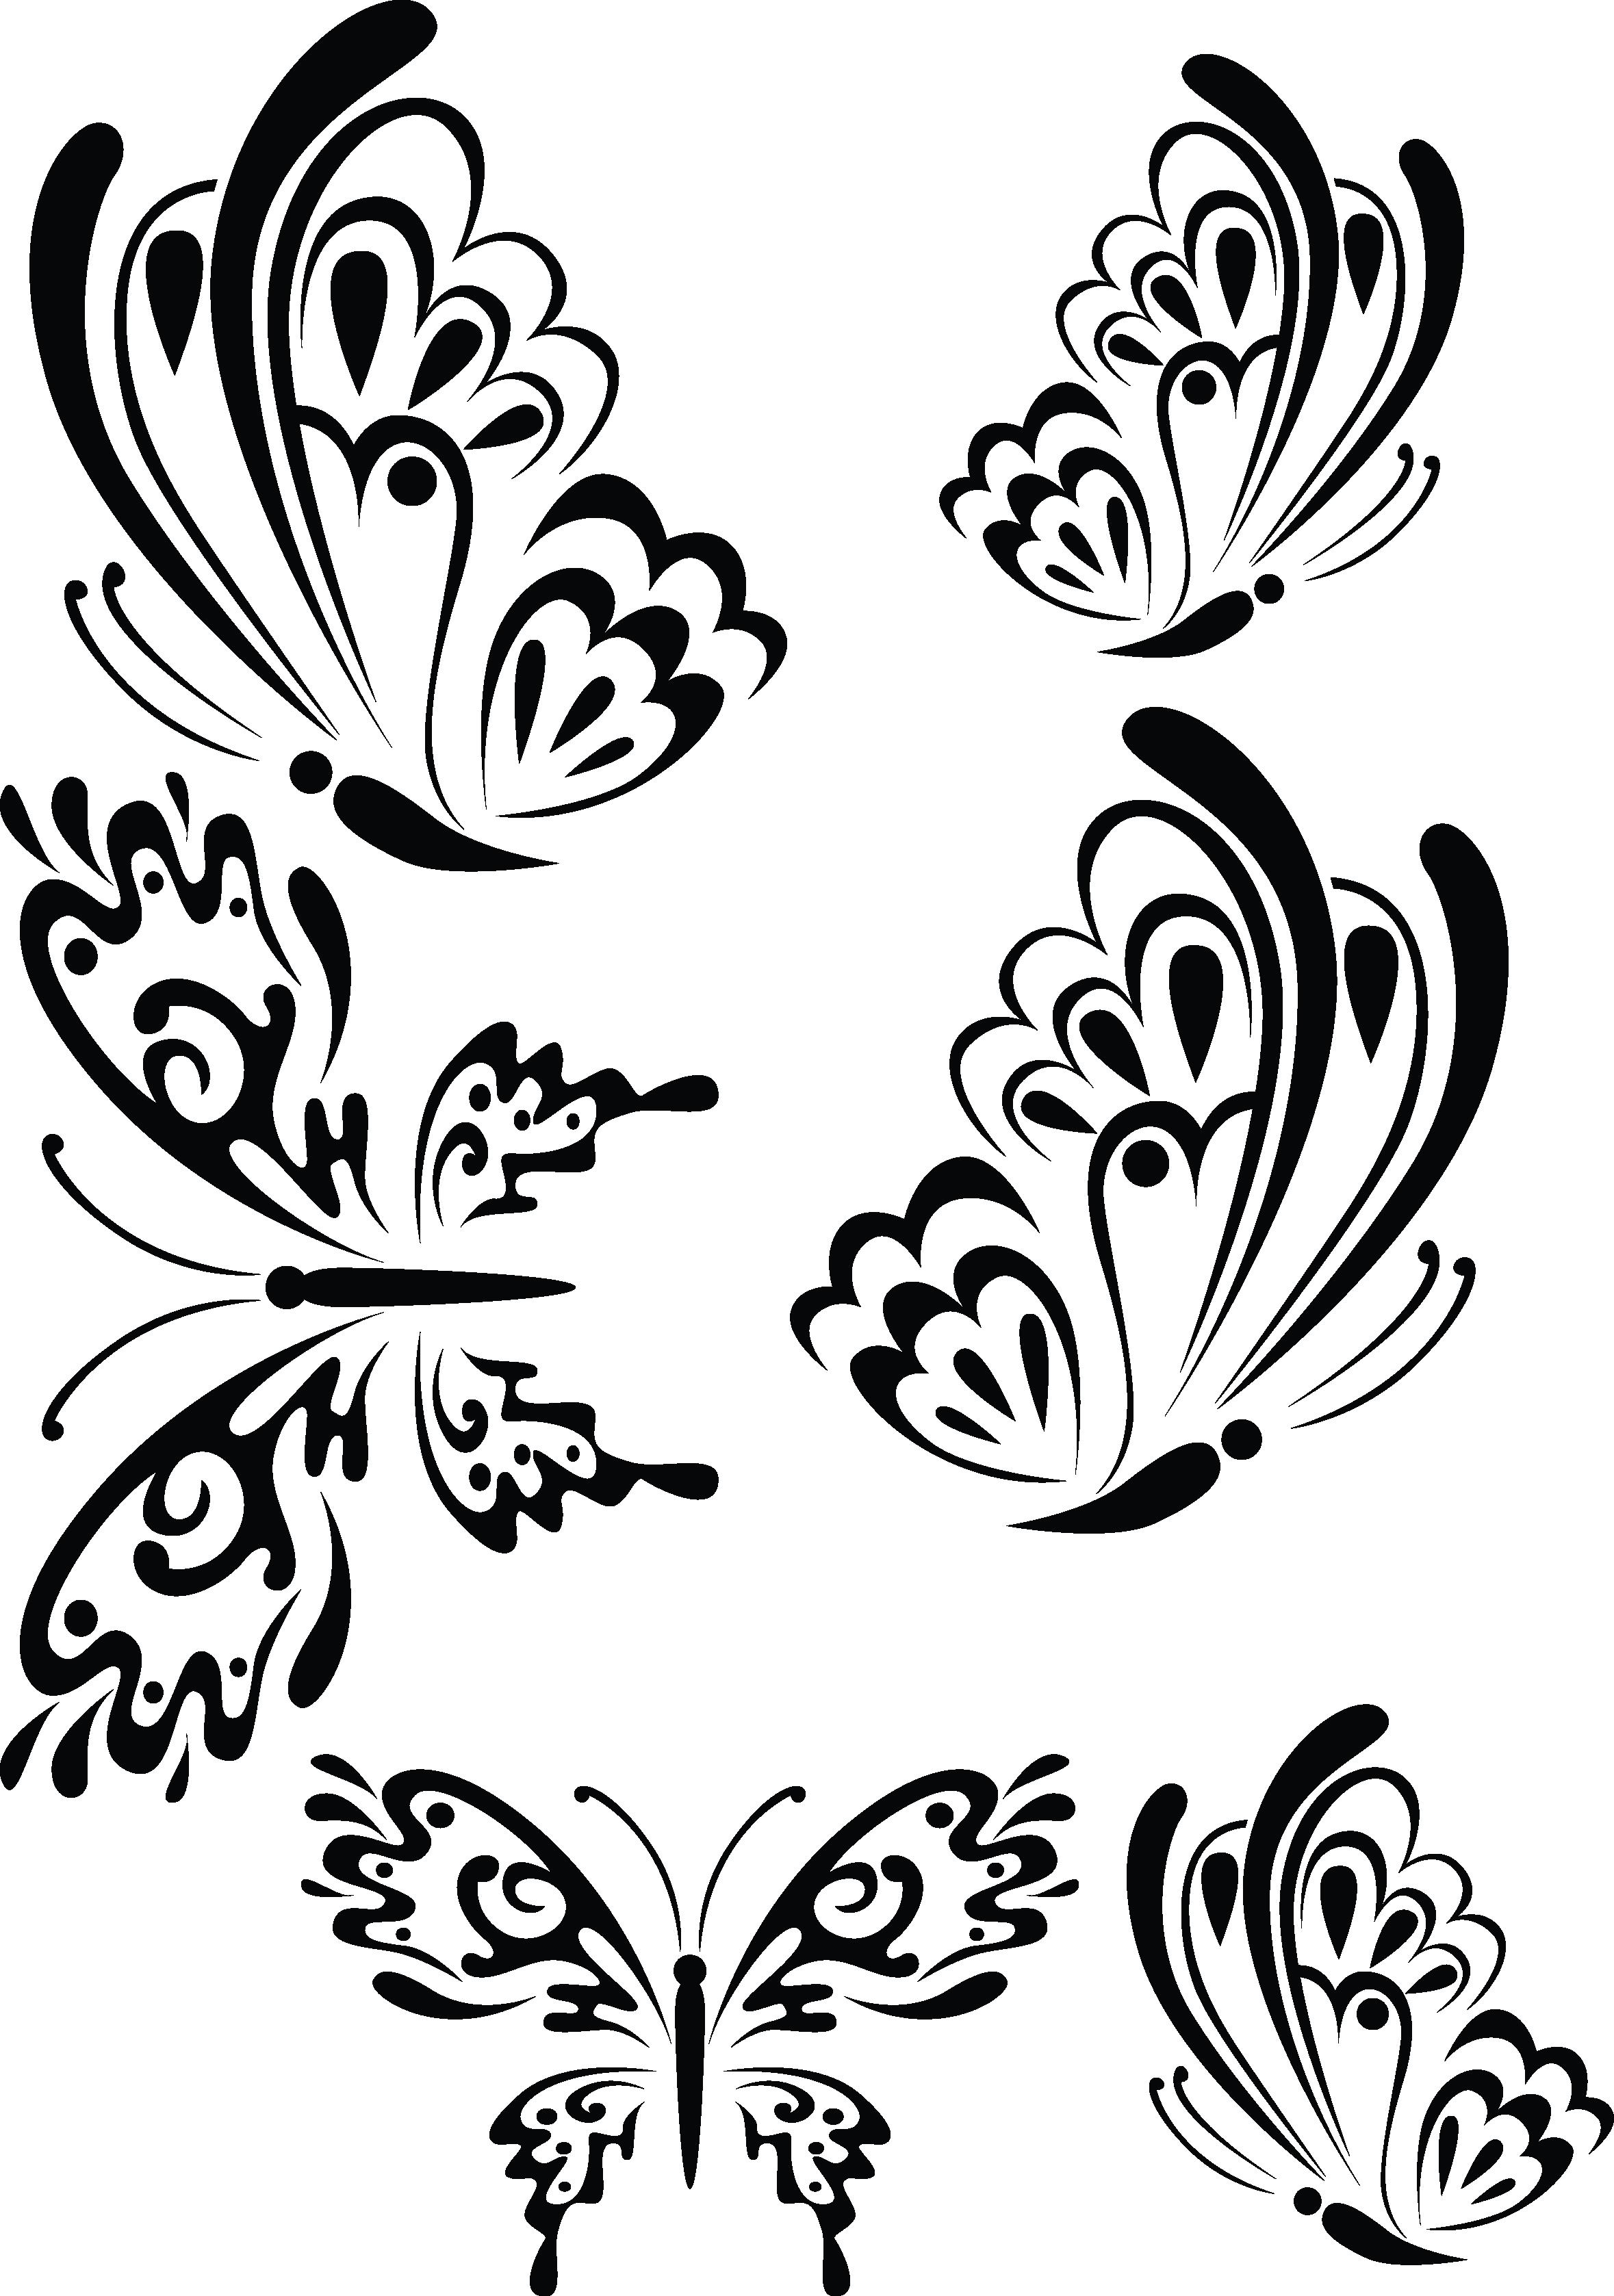 Butterflies2 | quilling | Pinterest | Mariposas, Dibujo y Siluetas